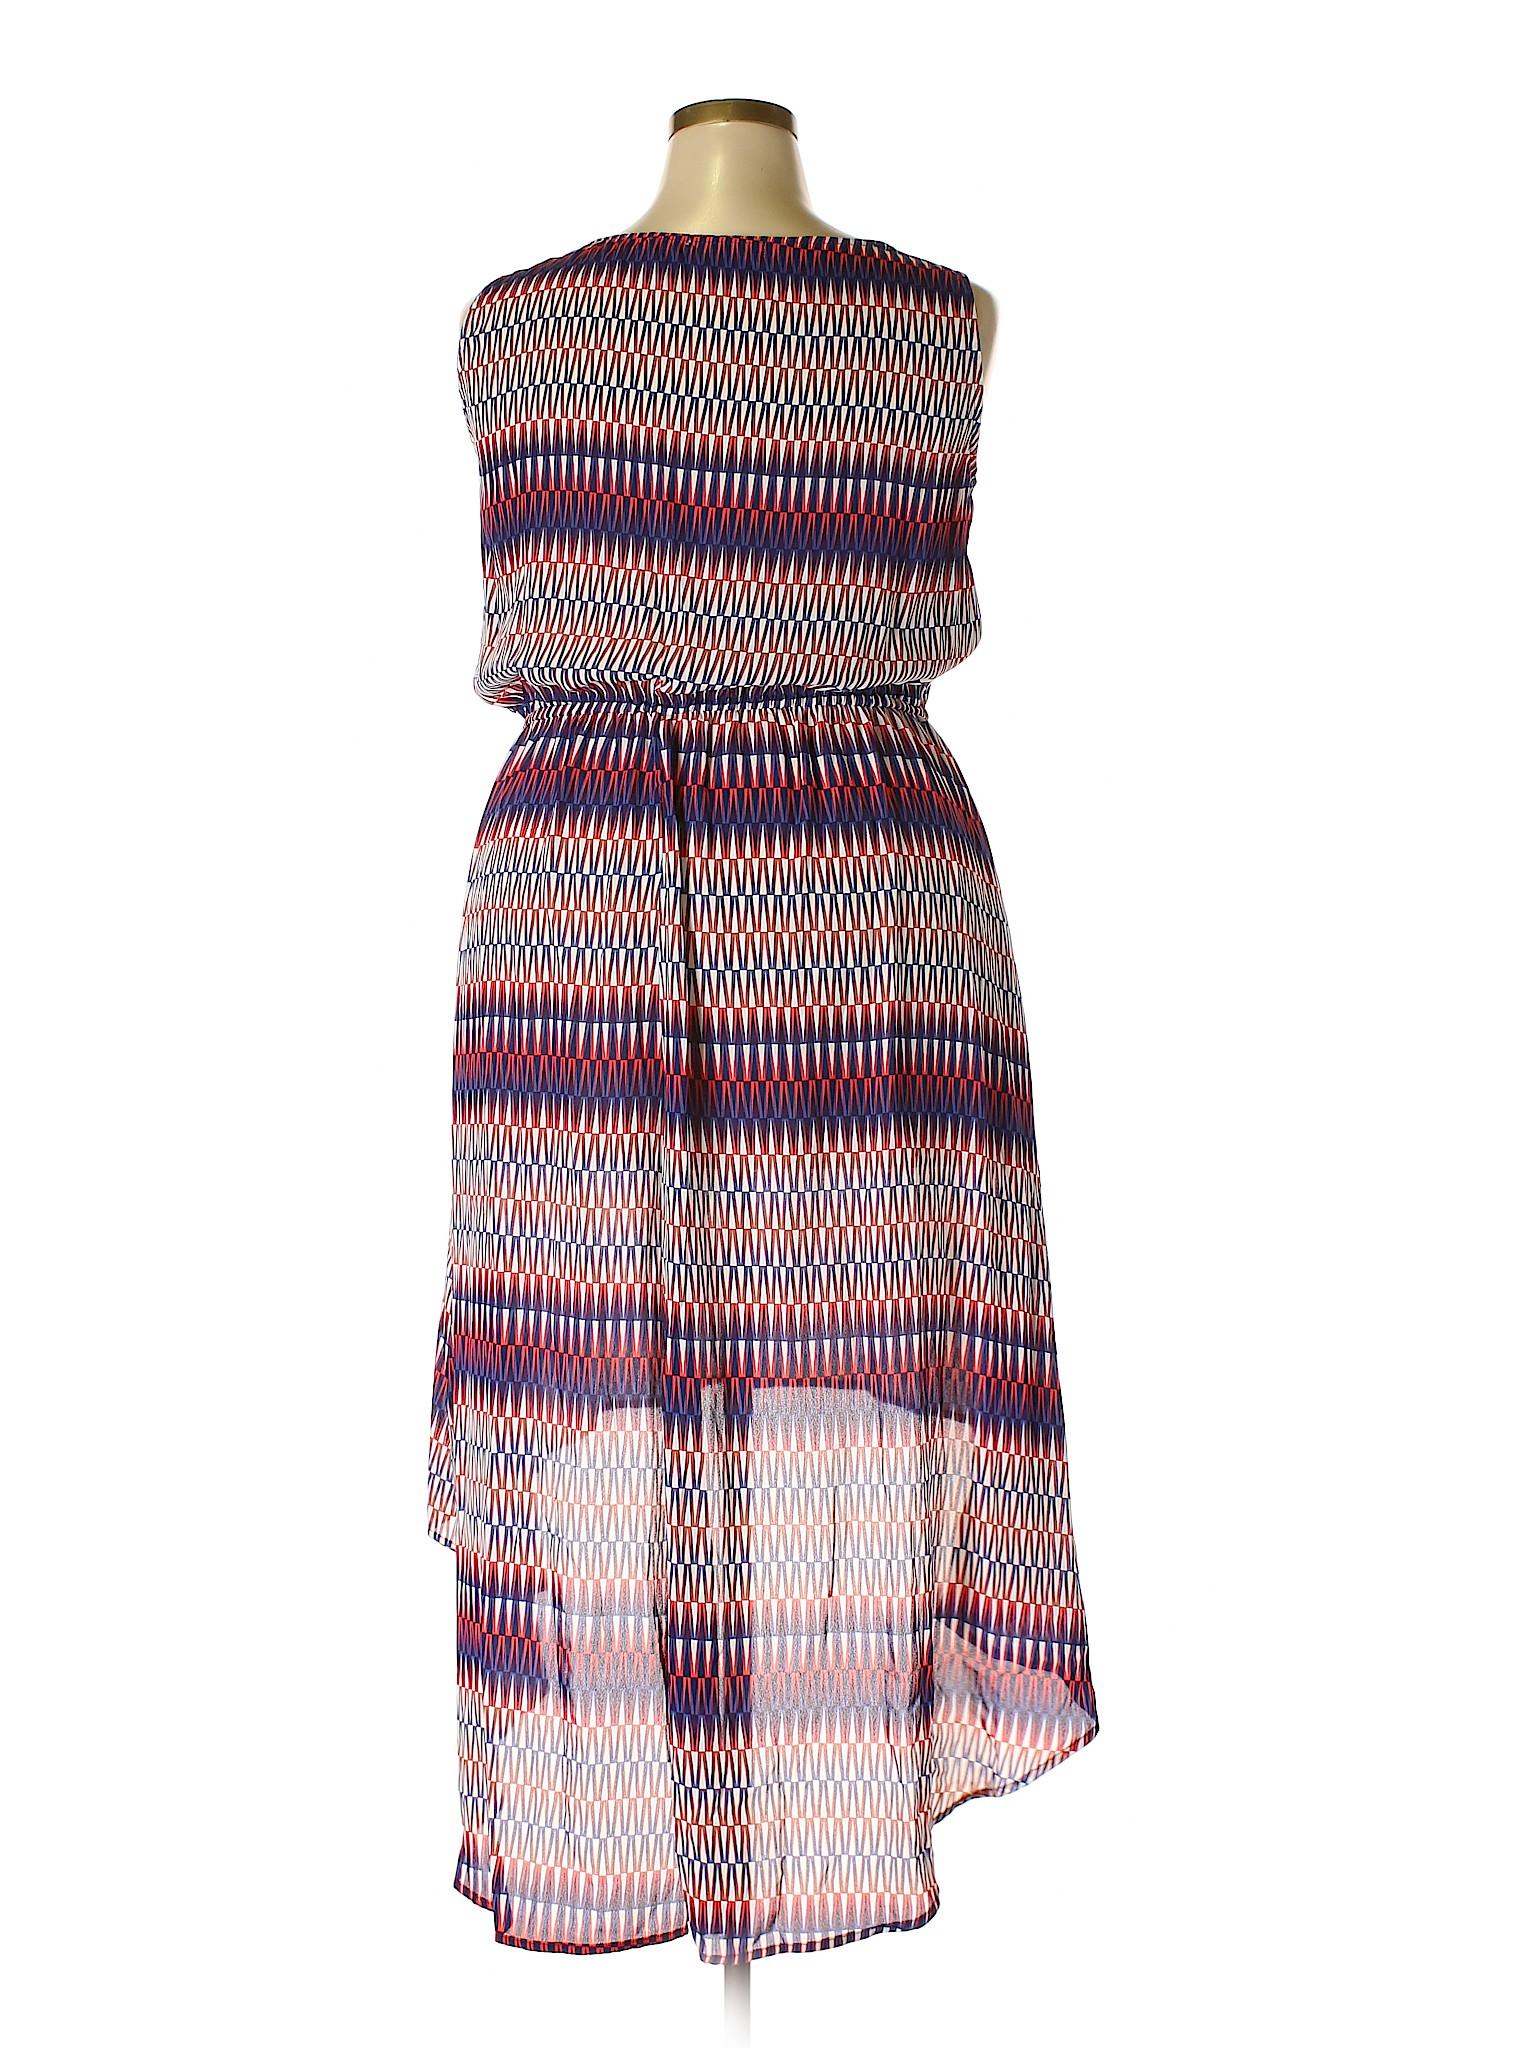 Dress Love winter Boutique Casual Liberty R1gcqIqaWw